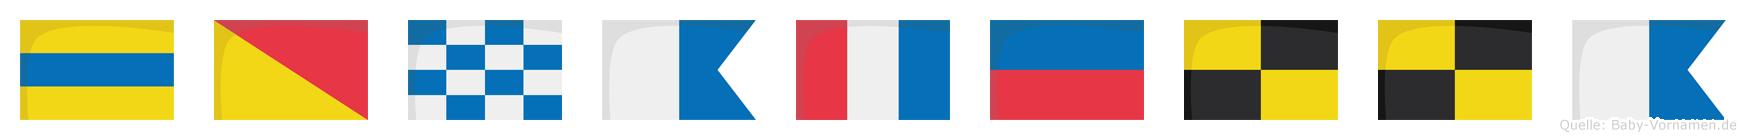 Donatella im Flaggenalphabet